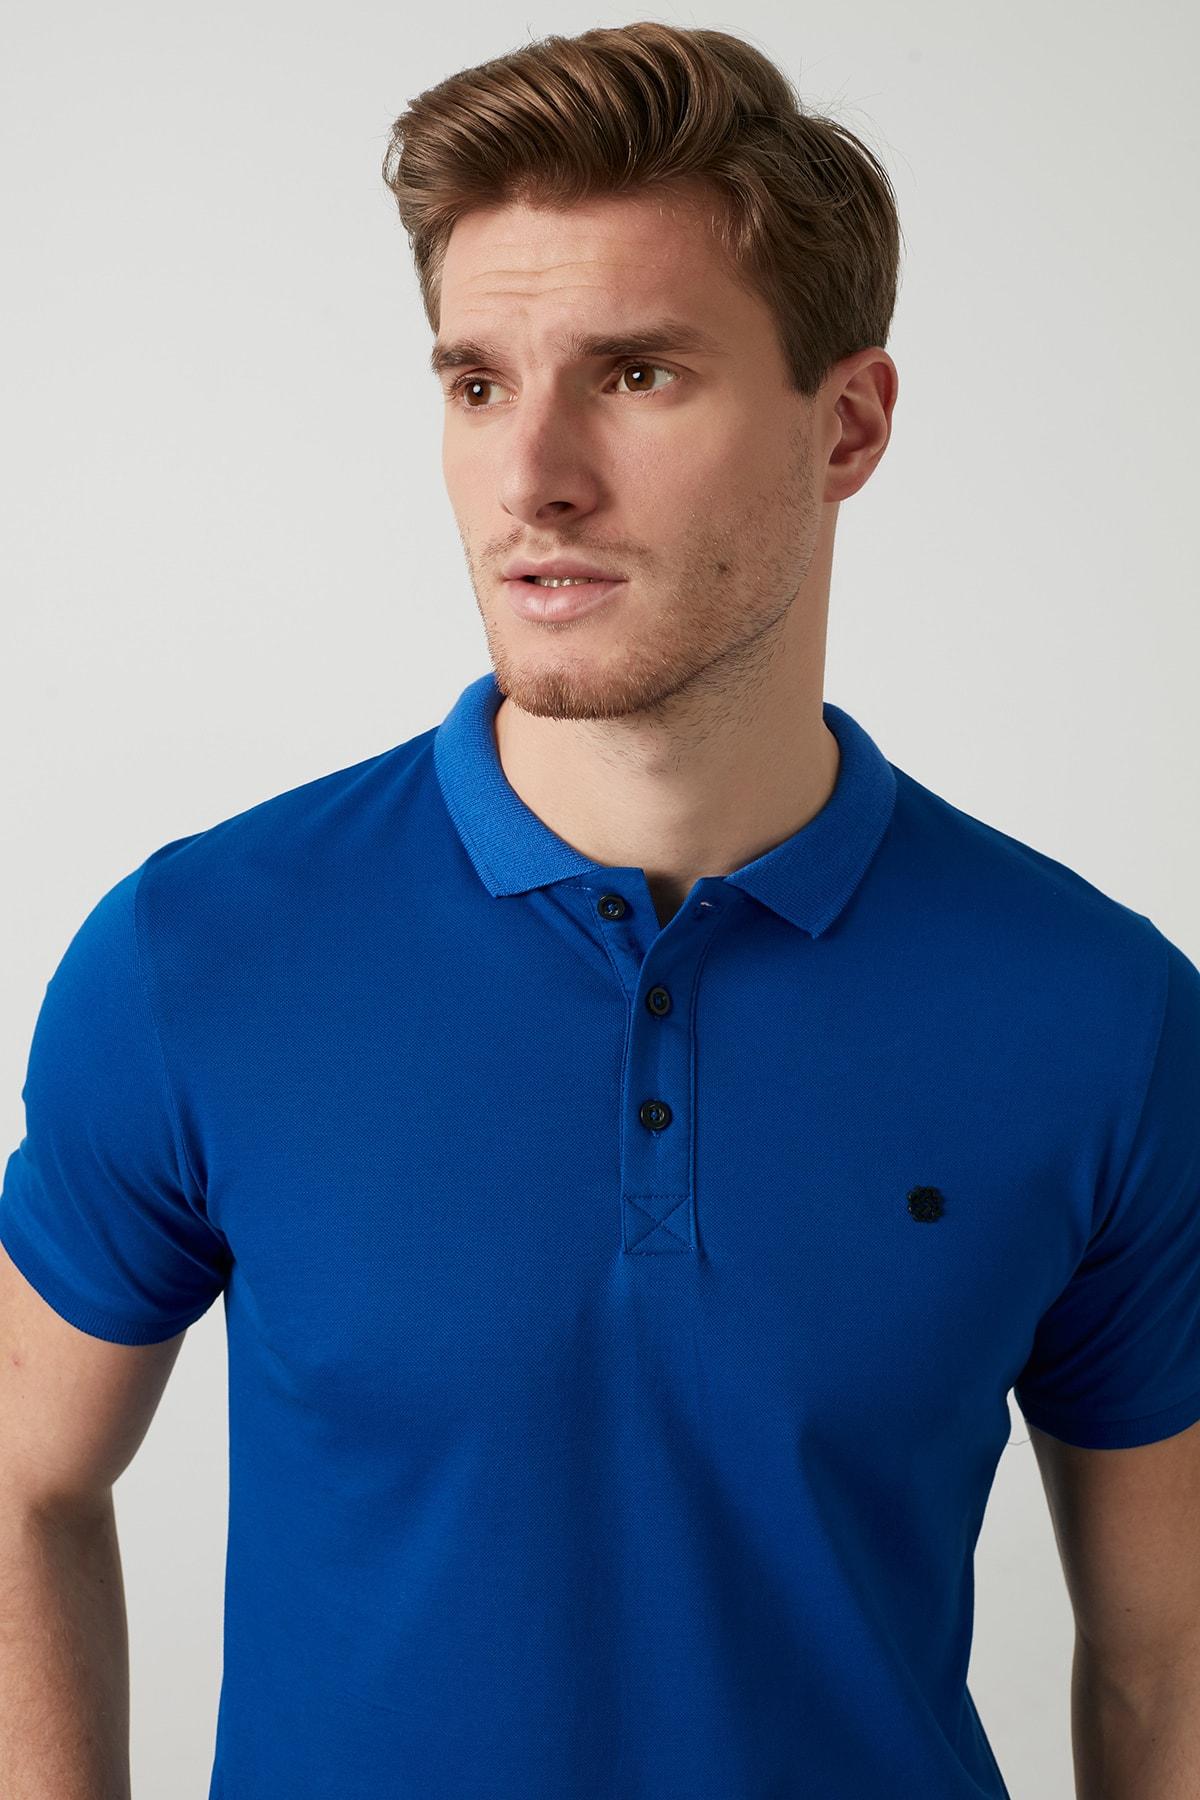 Buratti Erkek Parlıament Mavisi Düğmeli Polo Yaka Standart Fit Pamuklu T Shirt 0438101 2